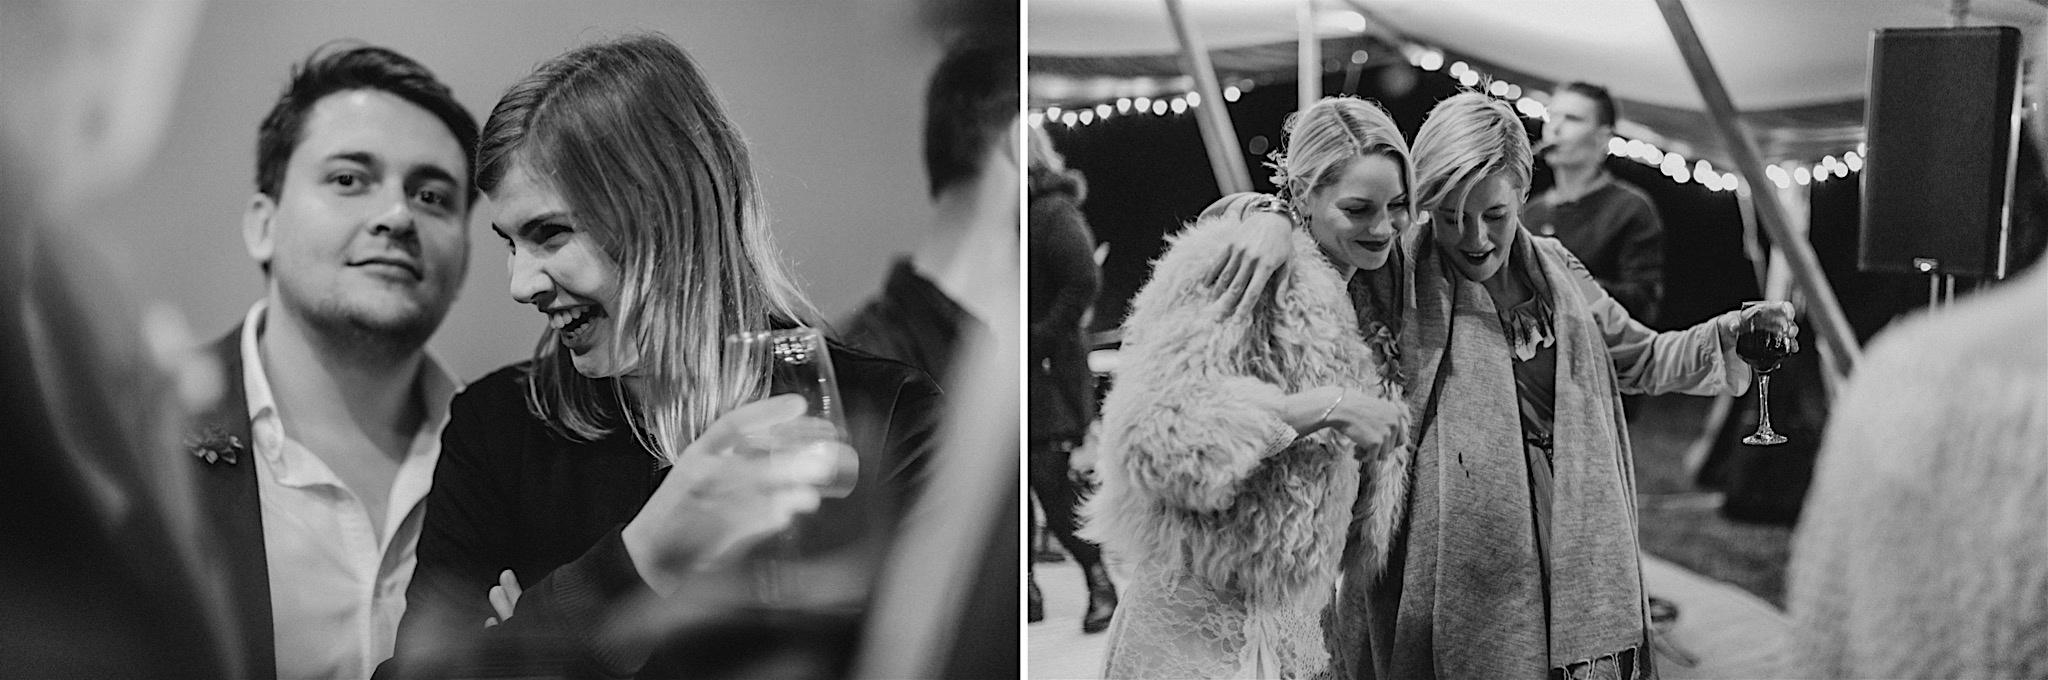 110_SBA-Jen-Tom-Wedding-455_SBA-Jen-Tom-Wedding-447.jpg